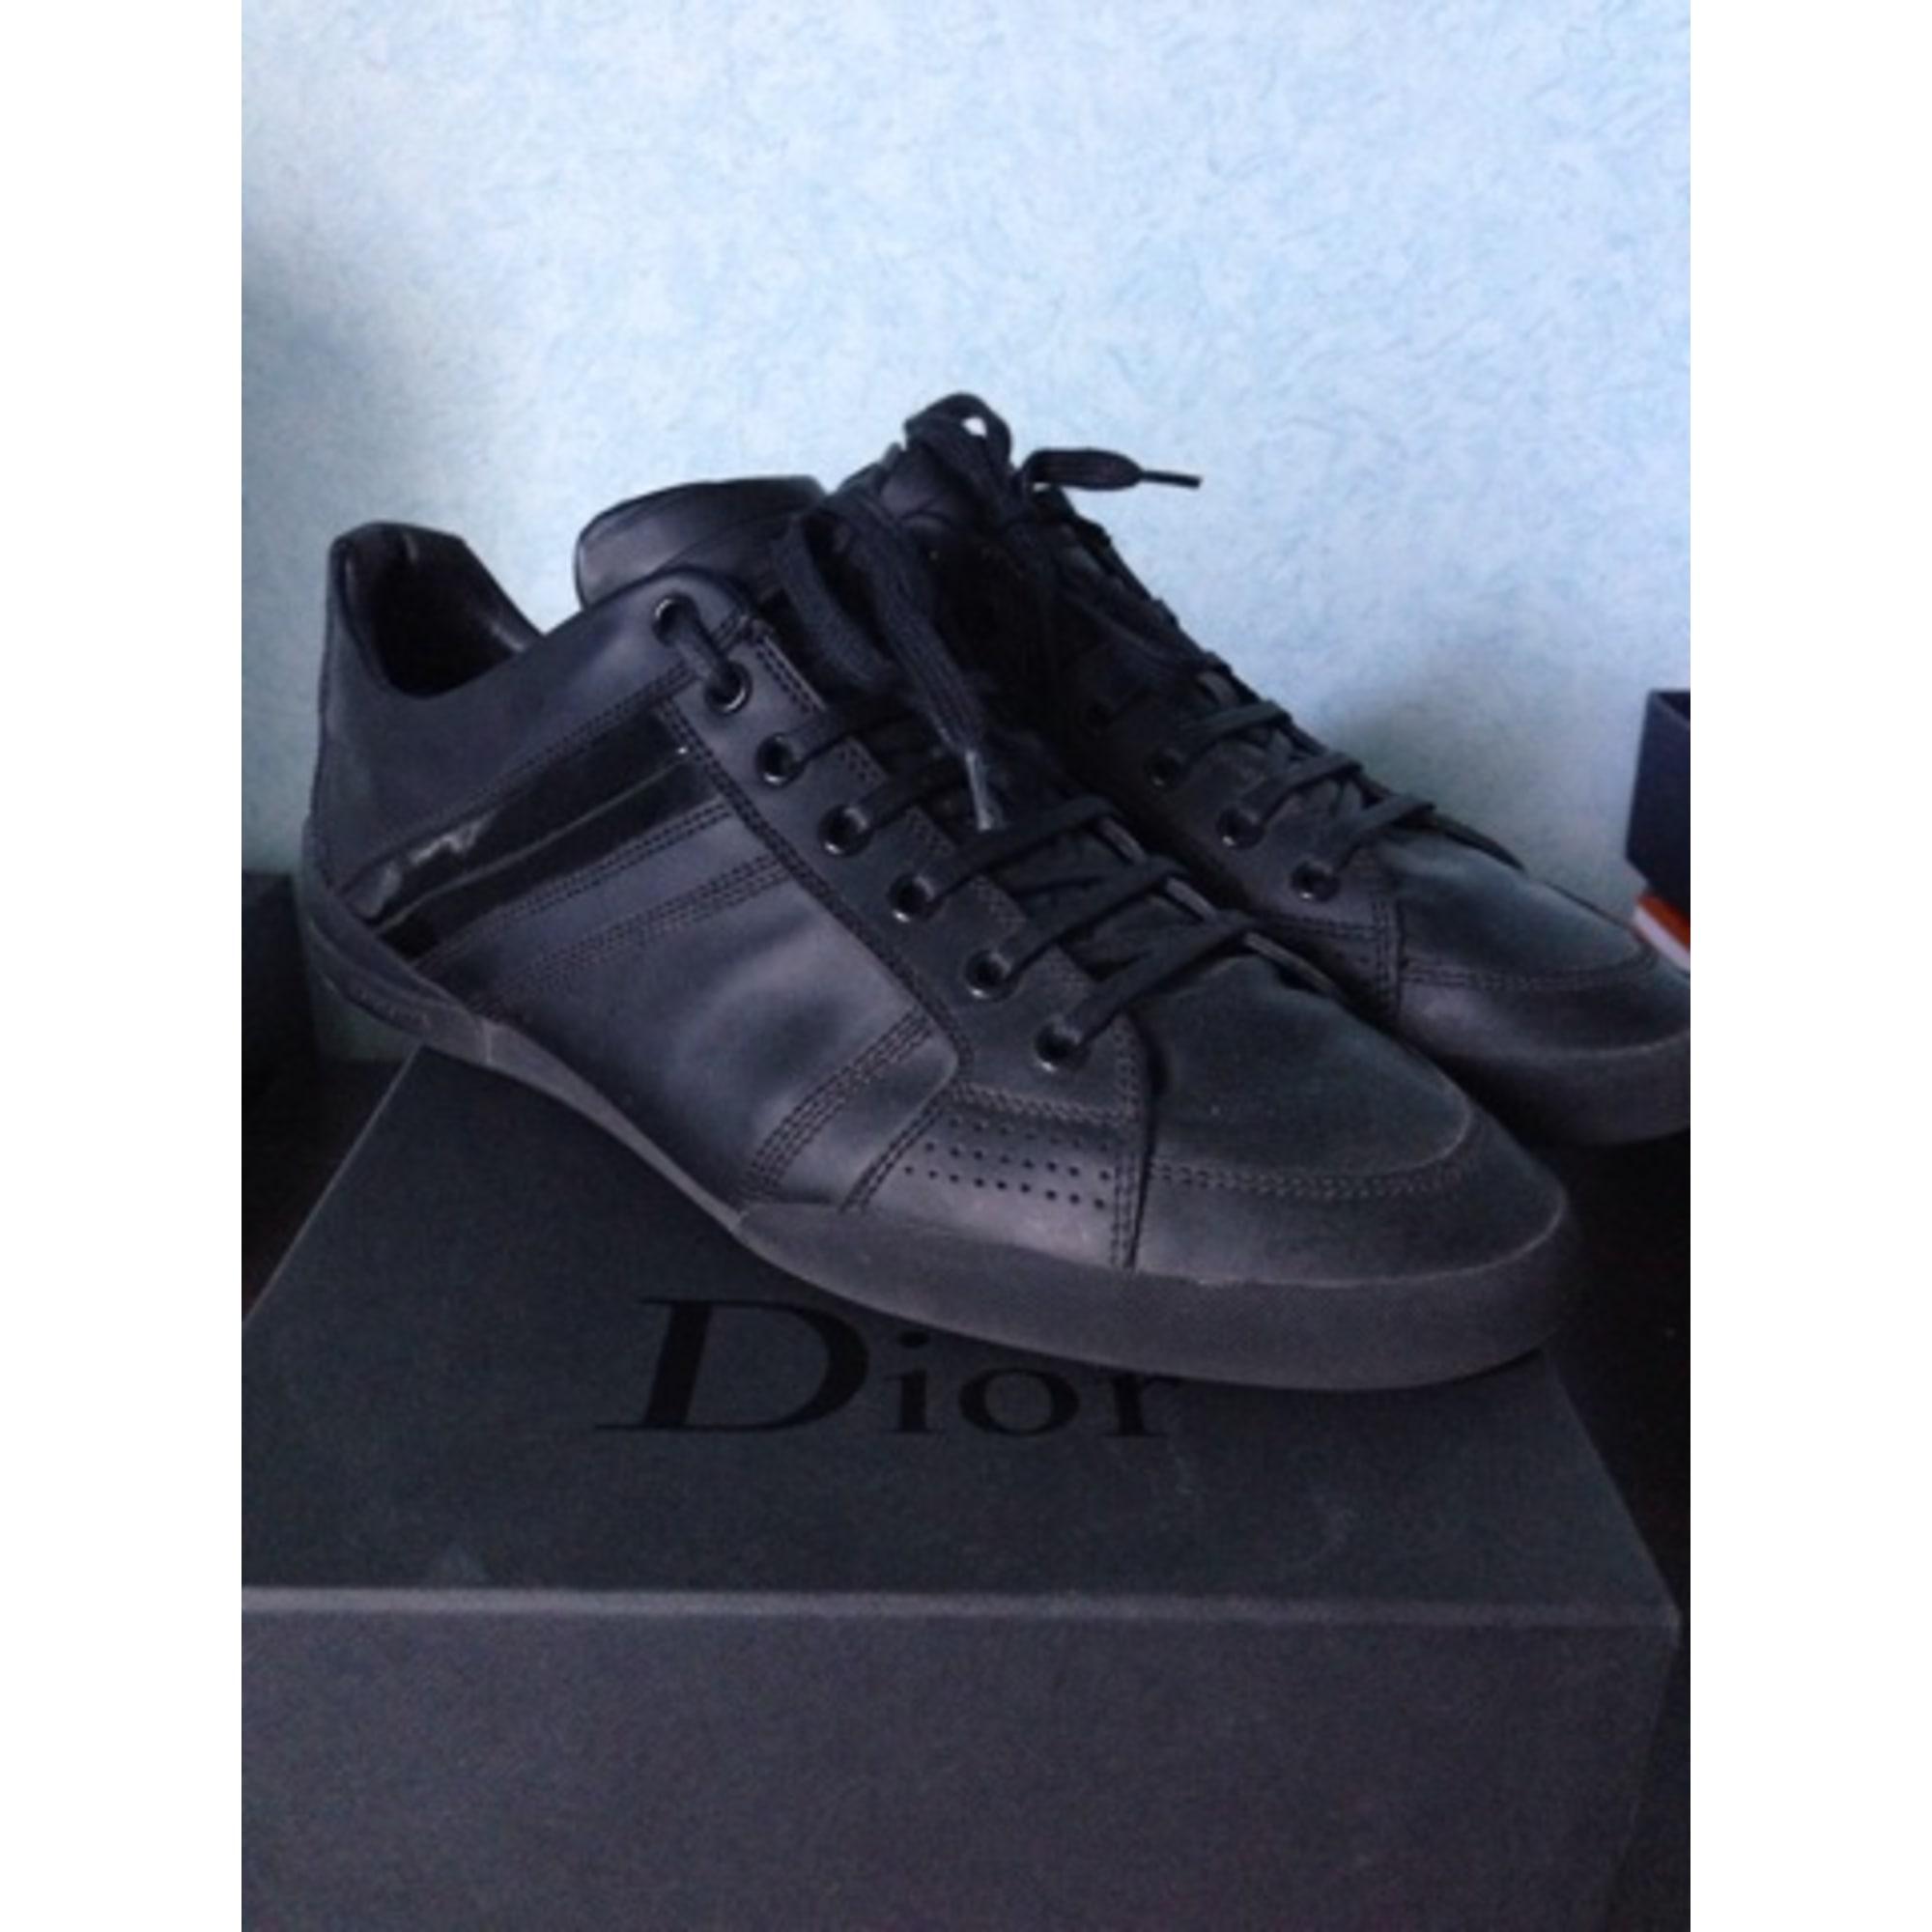 Baskets DIOR HOMME 41,5 noir vendu par Kislo - 2057463 3aa4457aea3